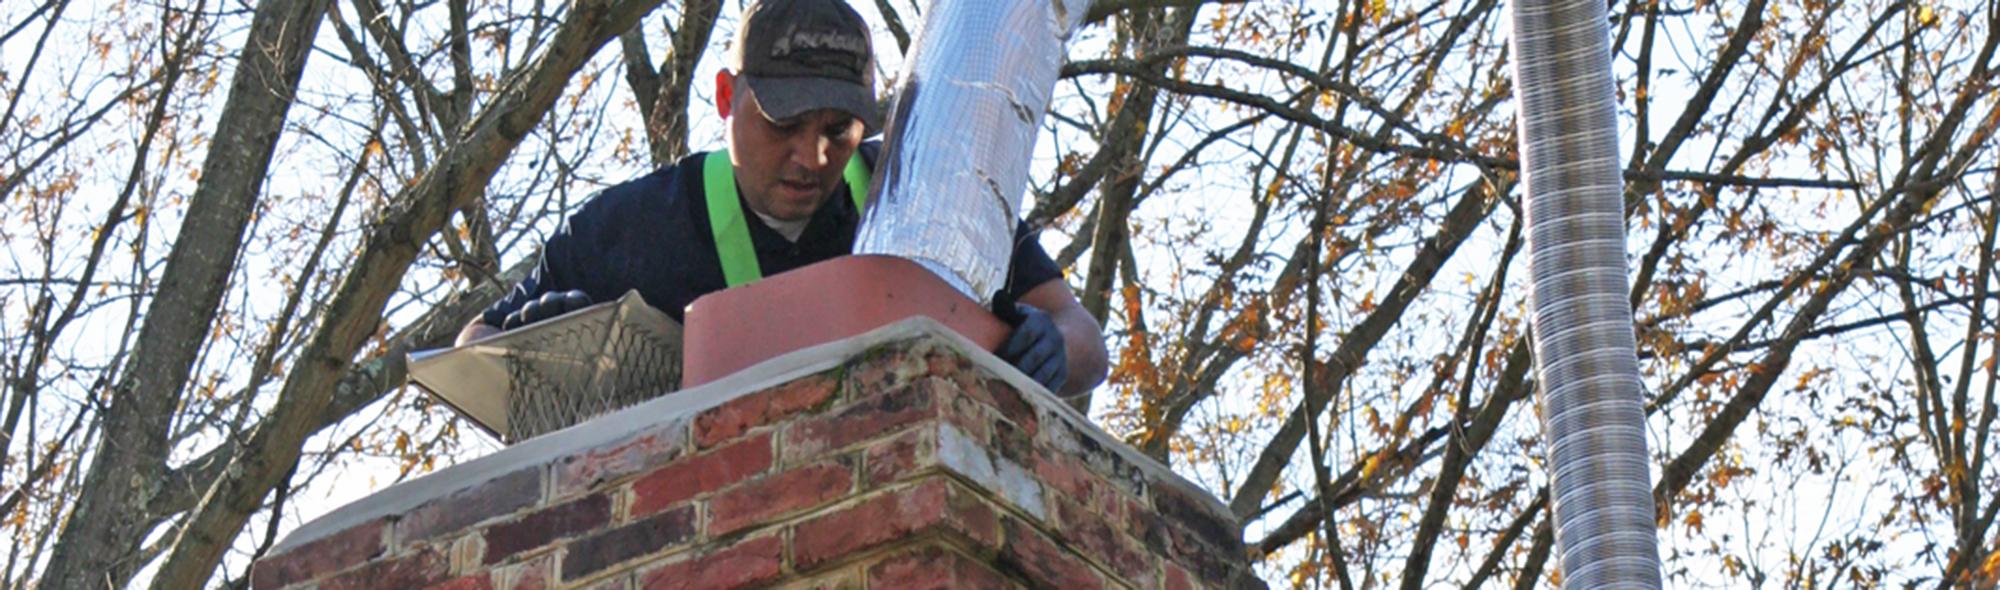 chimney repair in Annapolis MD